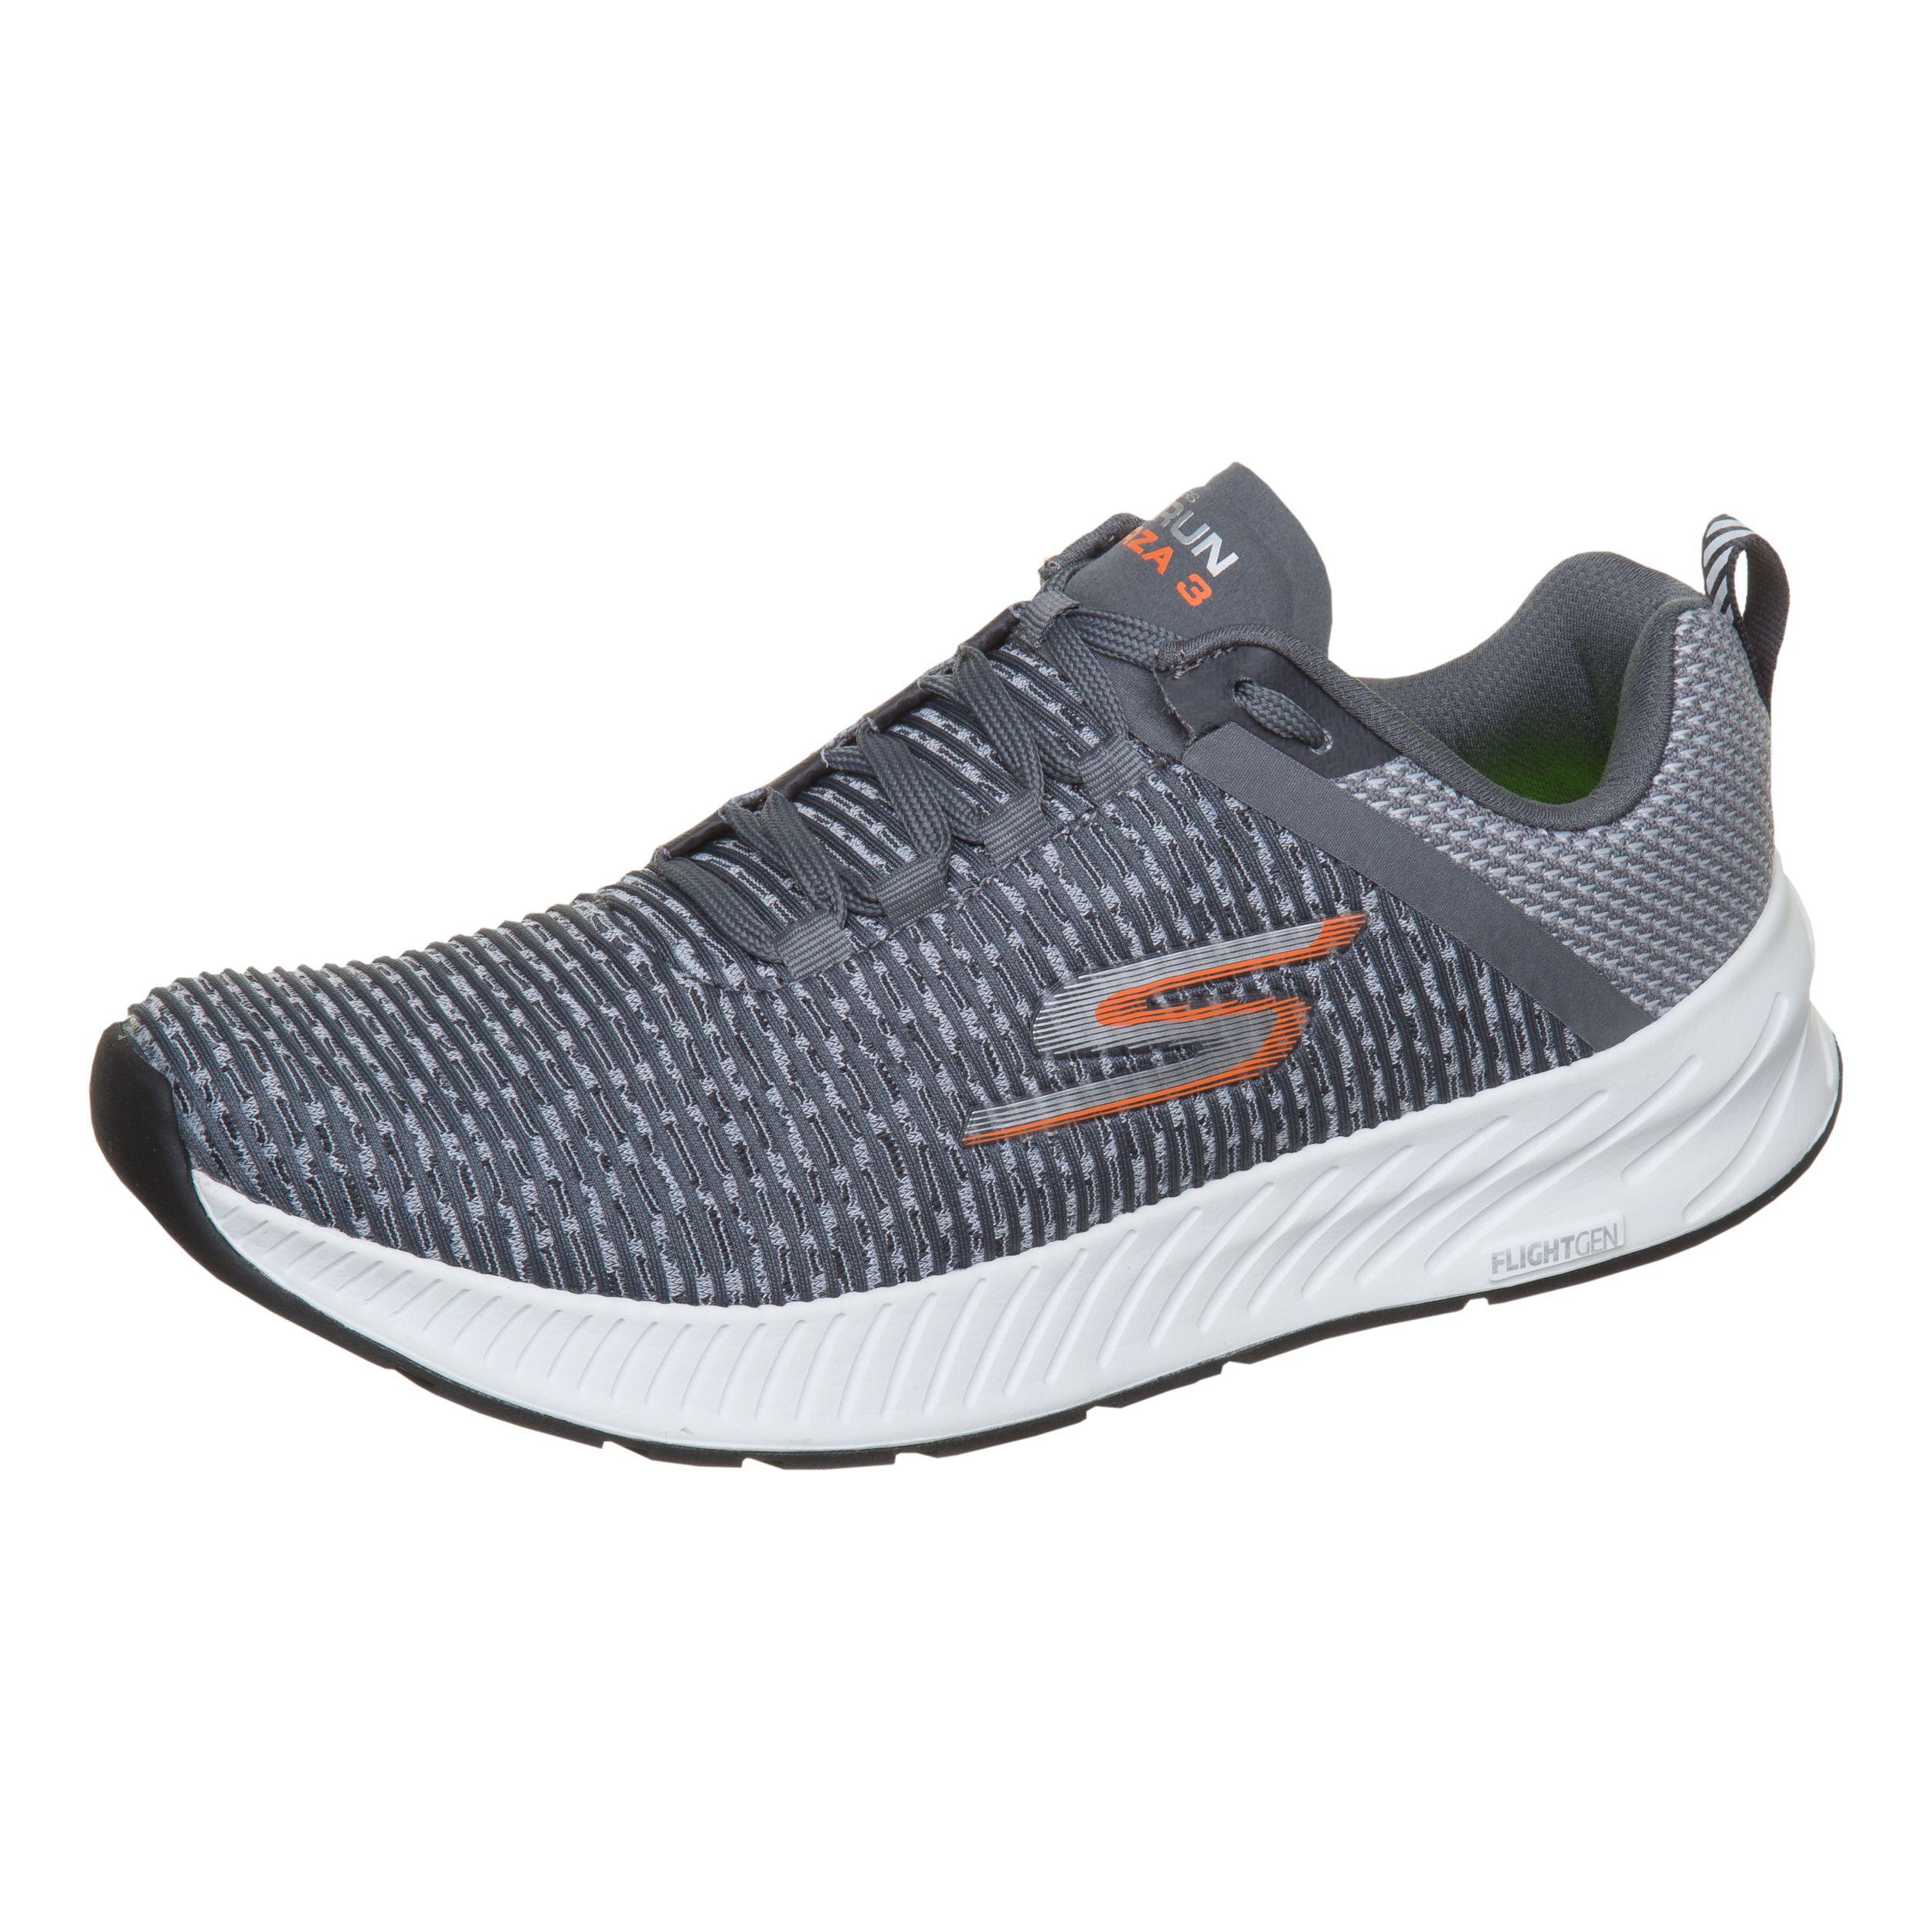 32aaeb3cd9aab Buy Skechers Go Run Forza 3 Stability Running Shoe Men Grey